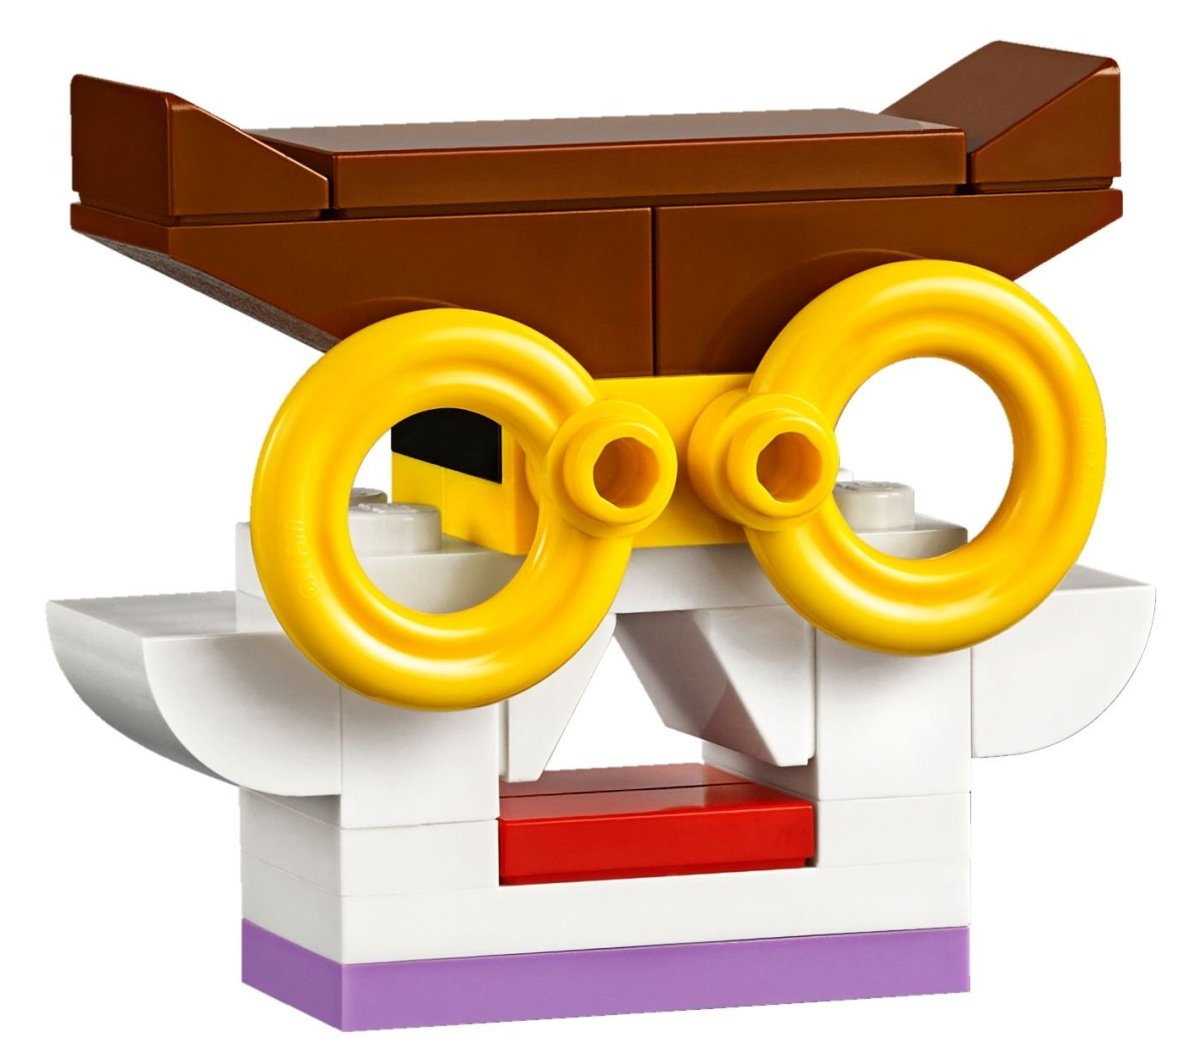 lego-classic-box-11009-2020-0009